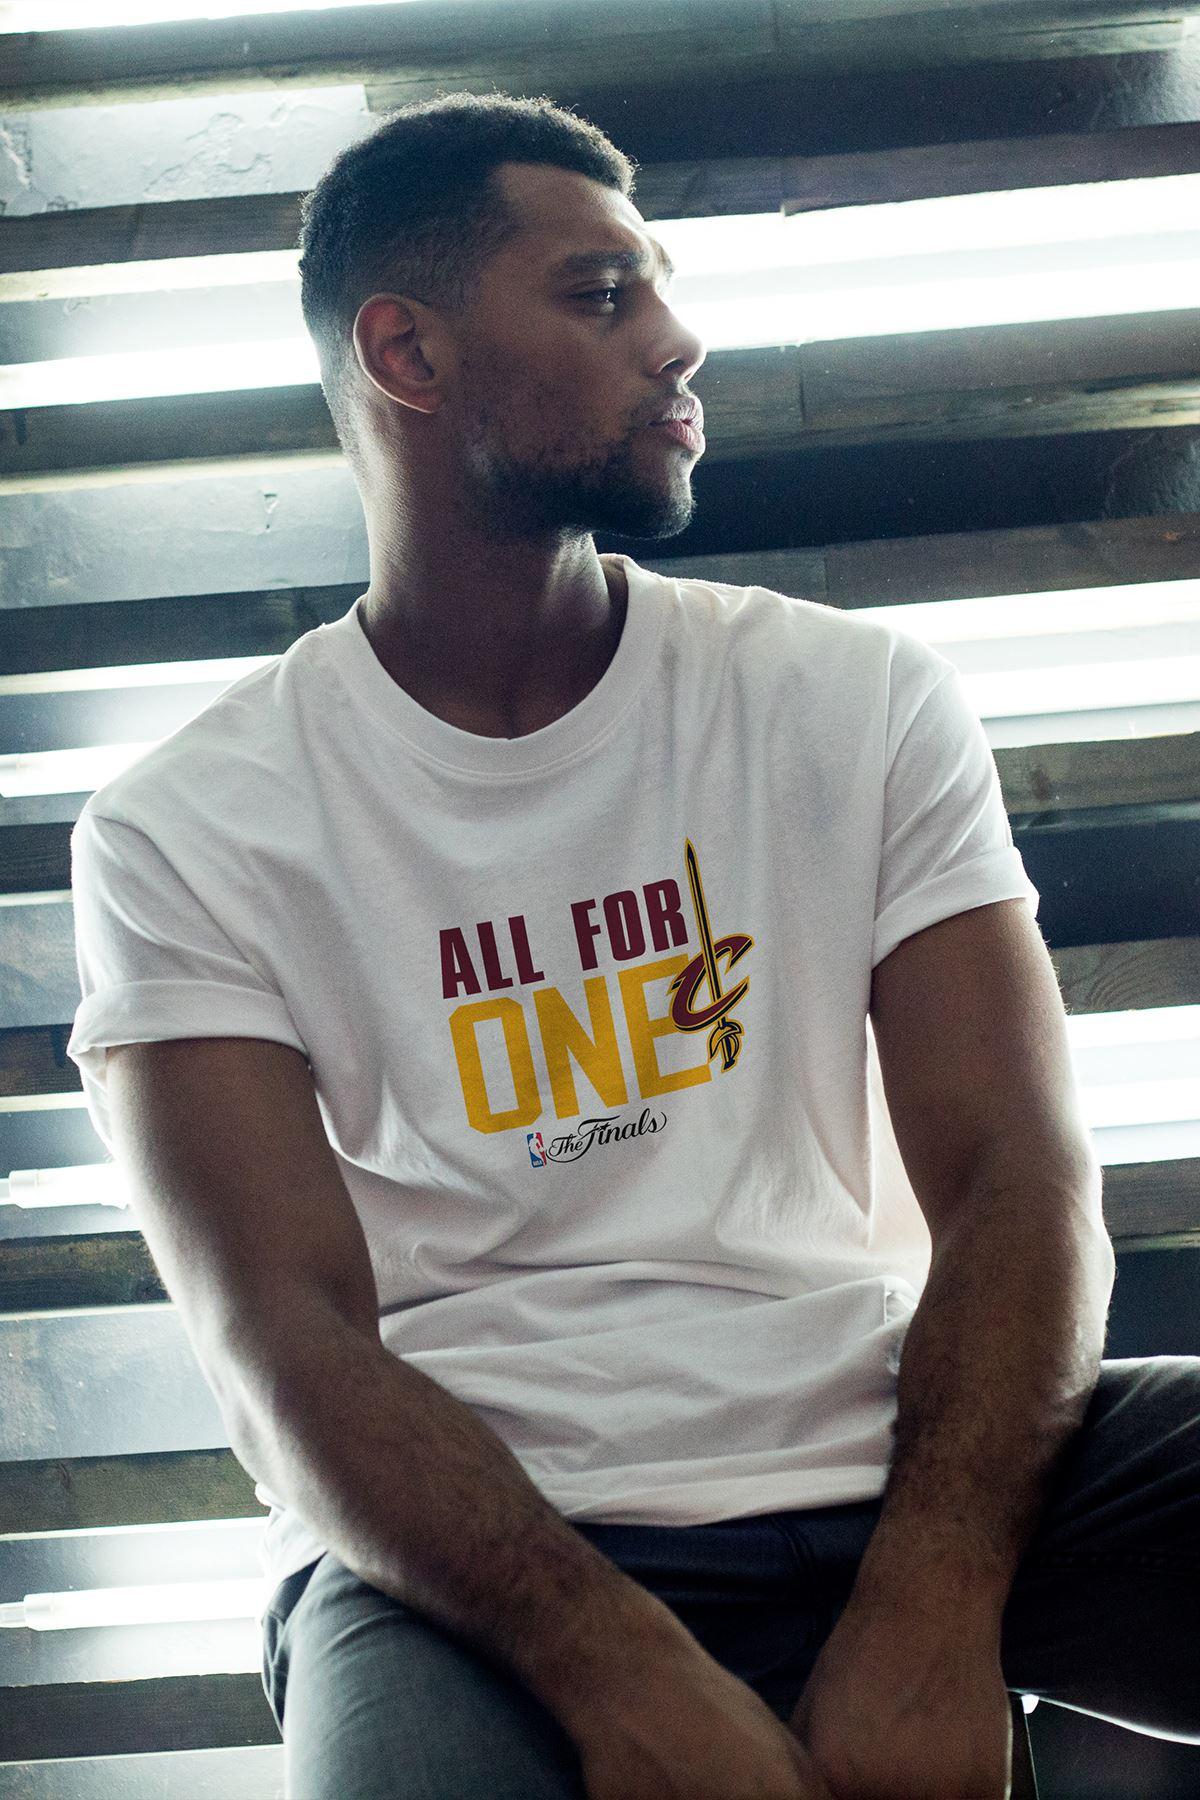 All For One Beyaz Erkek Oversize Tshirt - Tişört